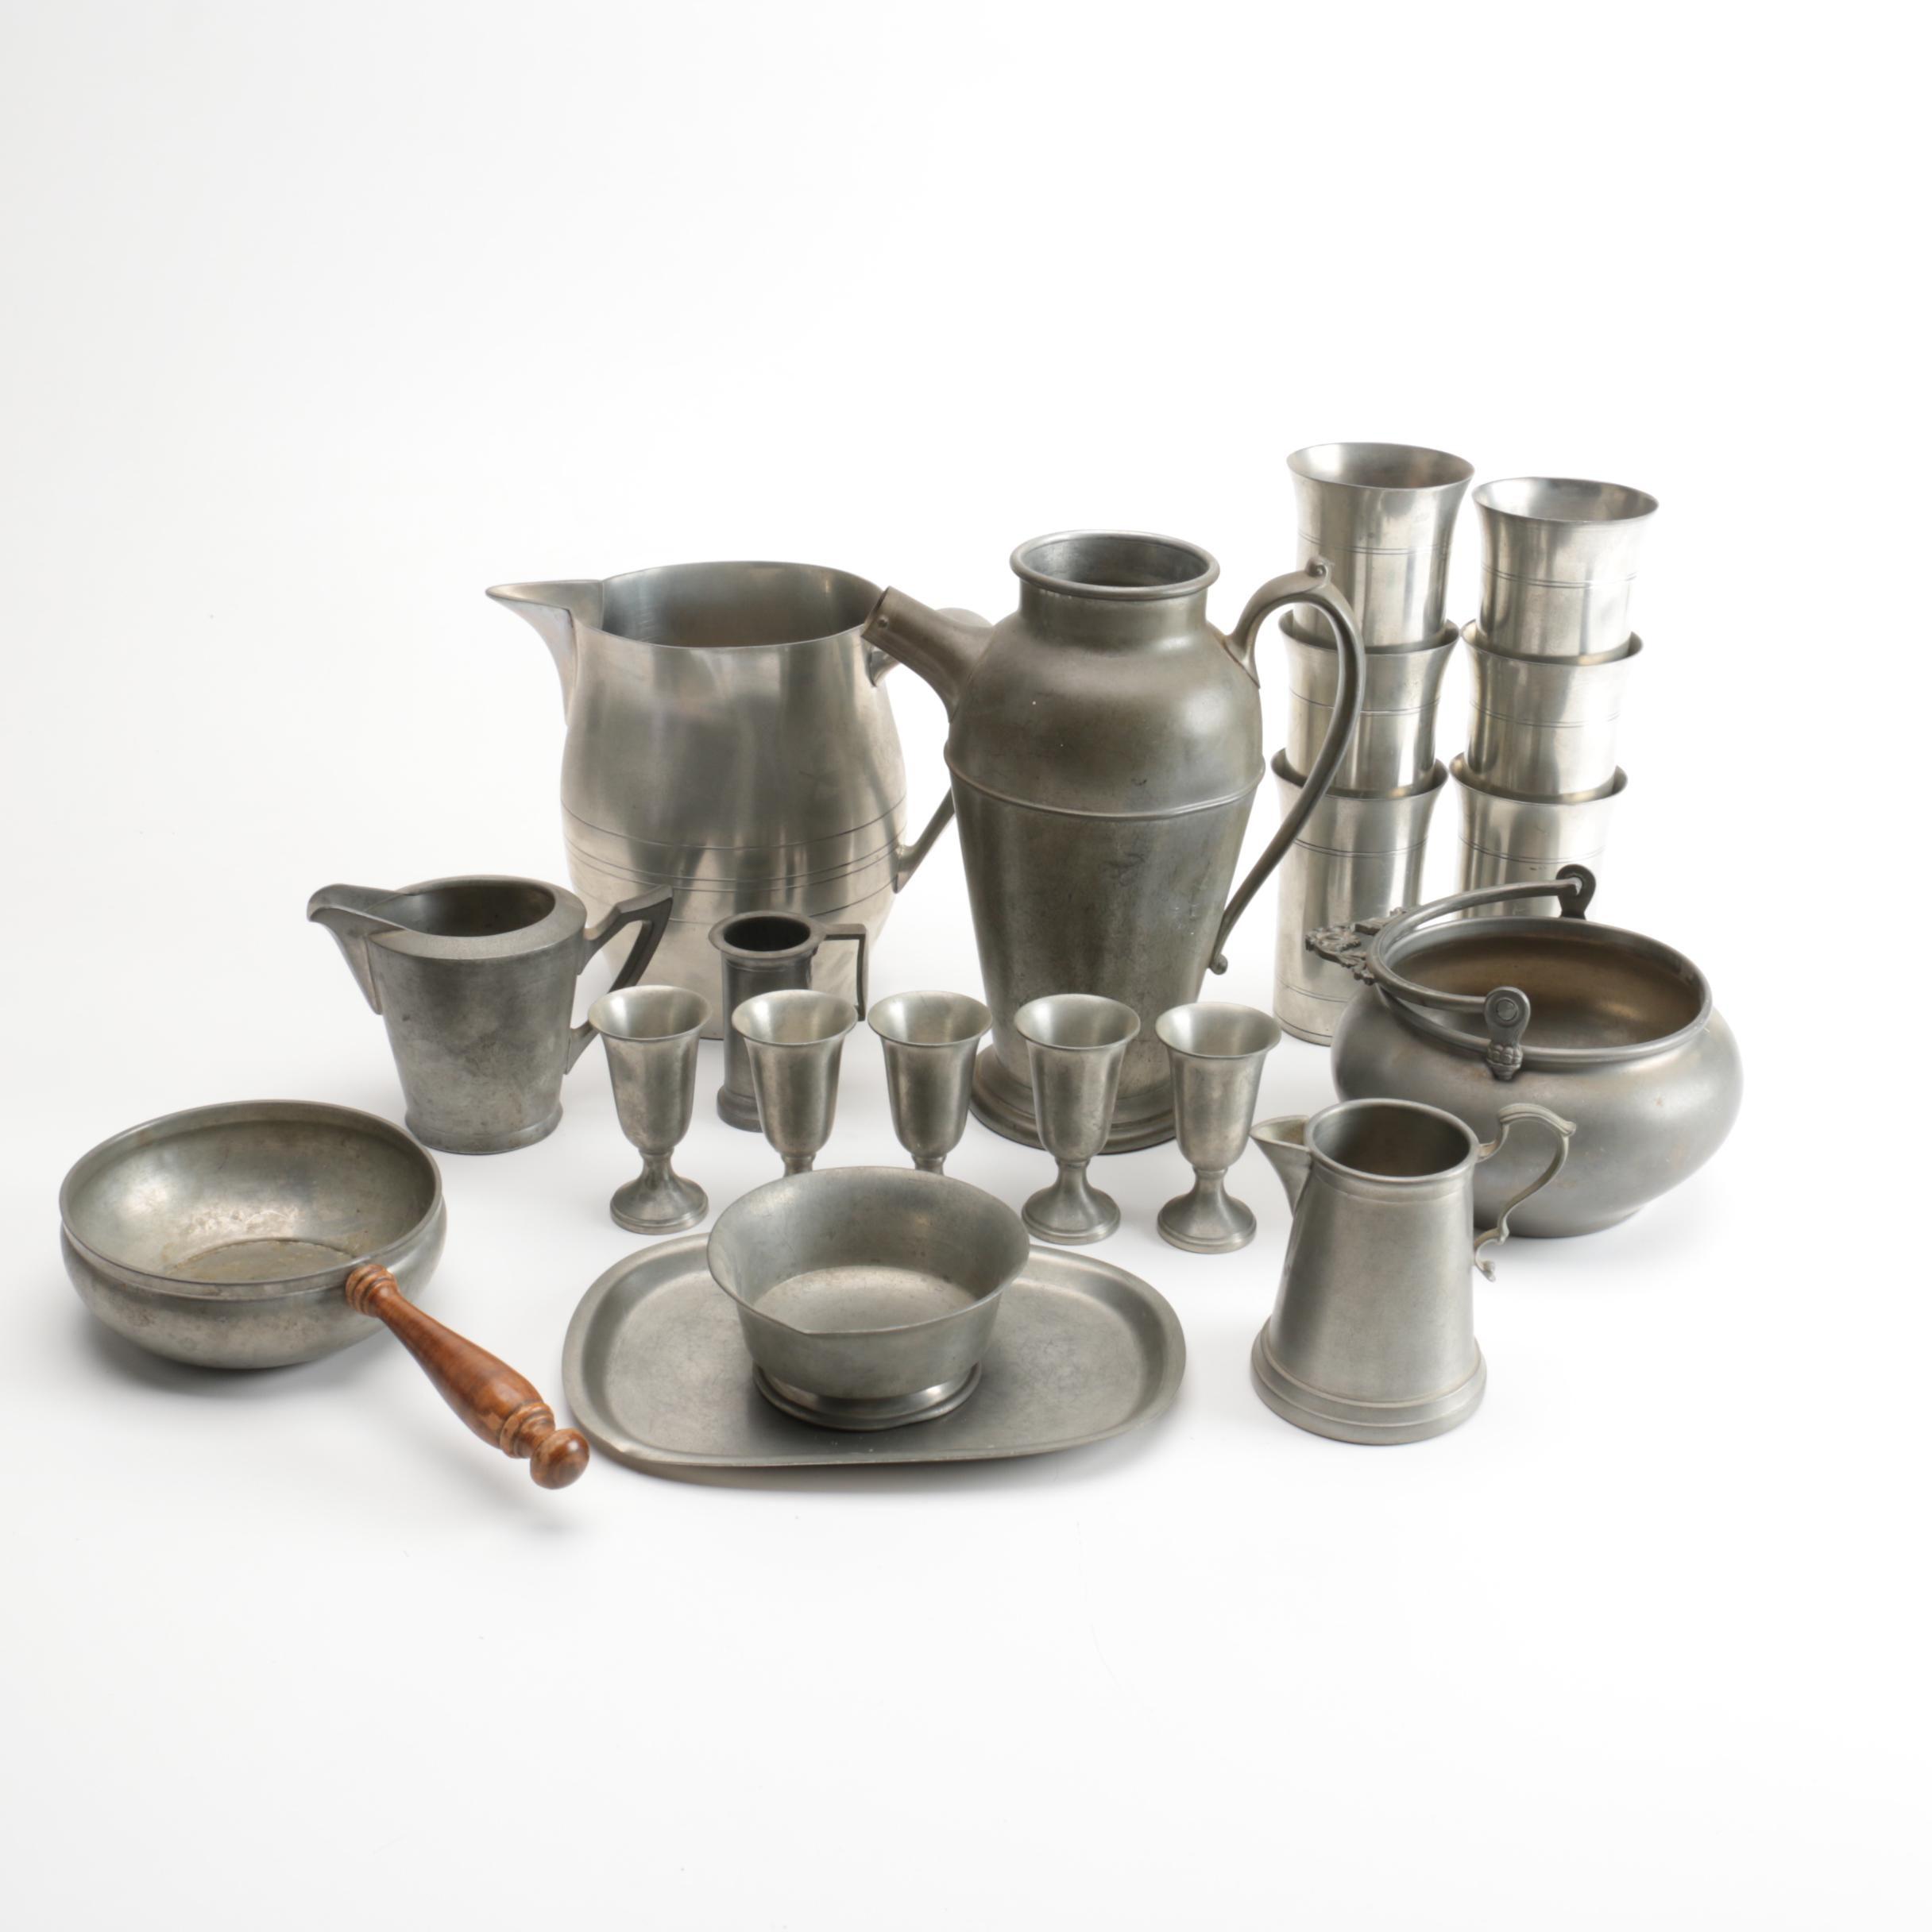 Vintage Bristol, International Silver Co. and Italian Pewter Tableware